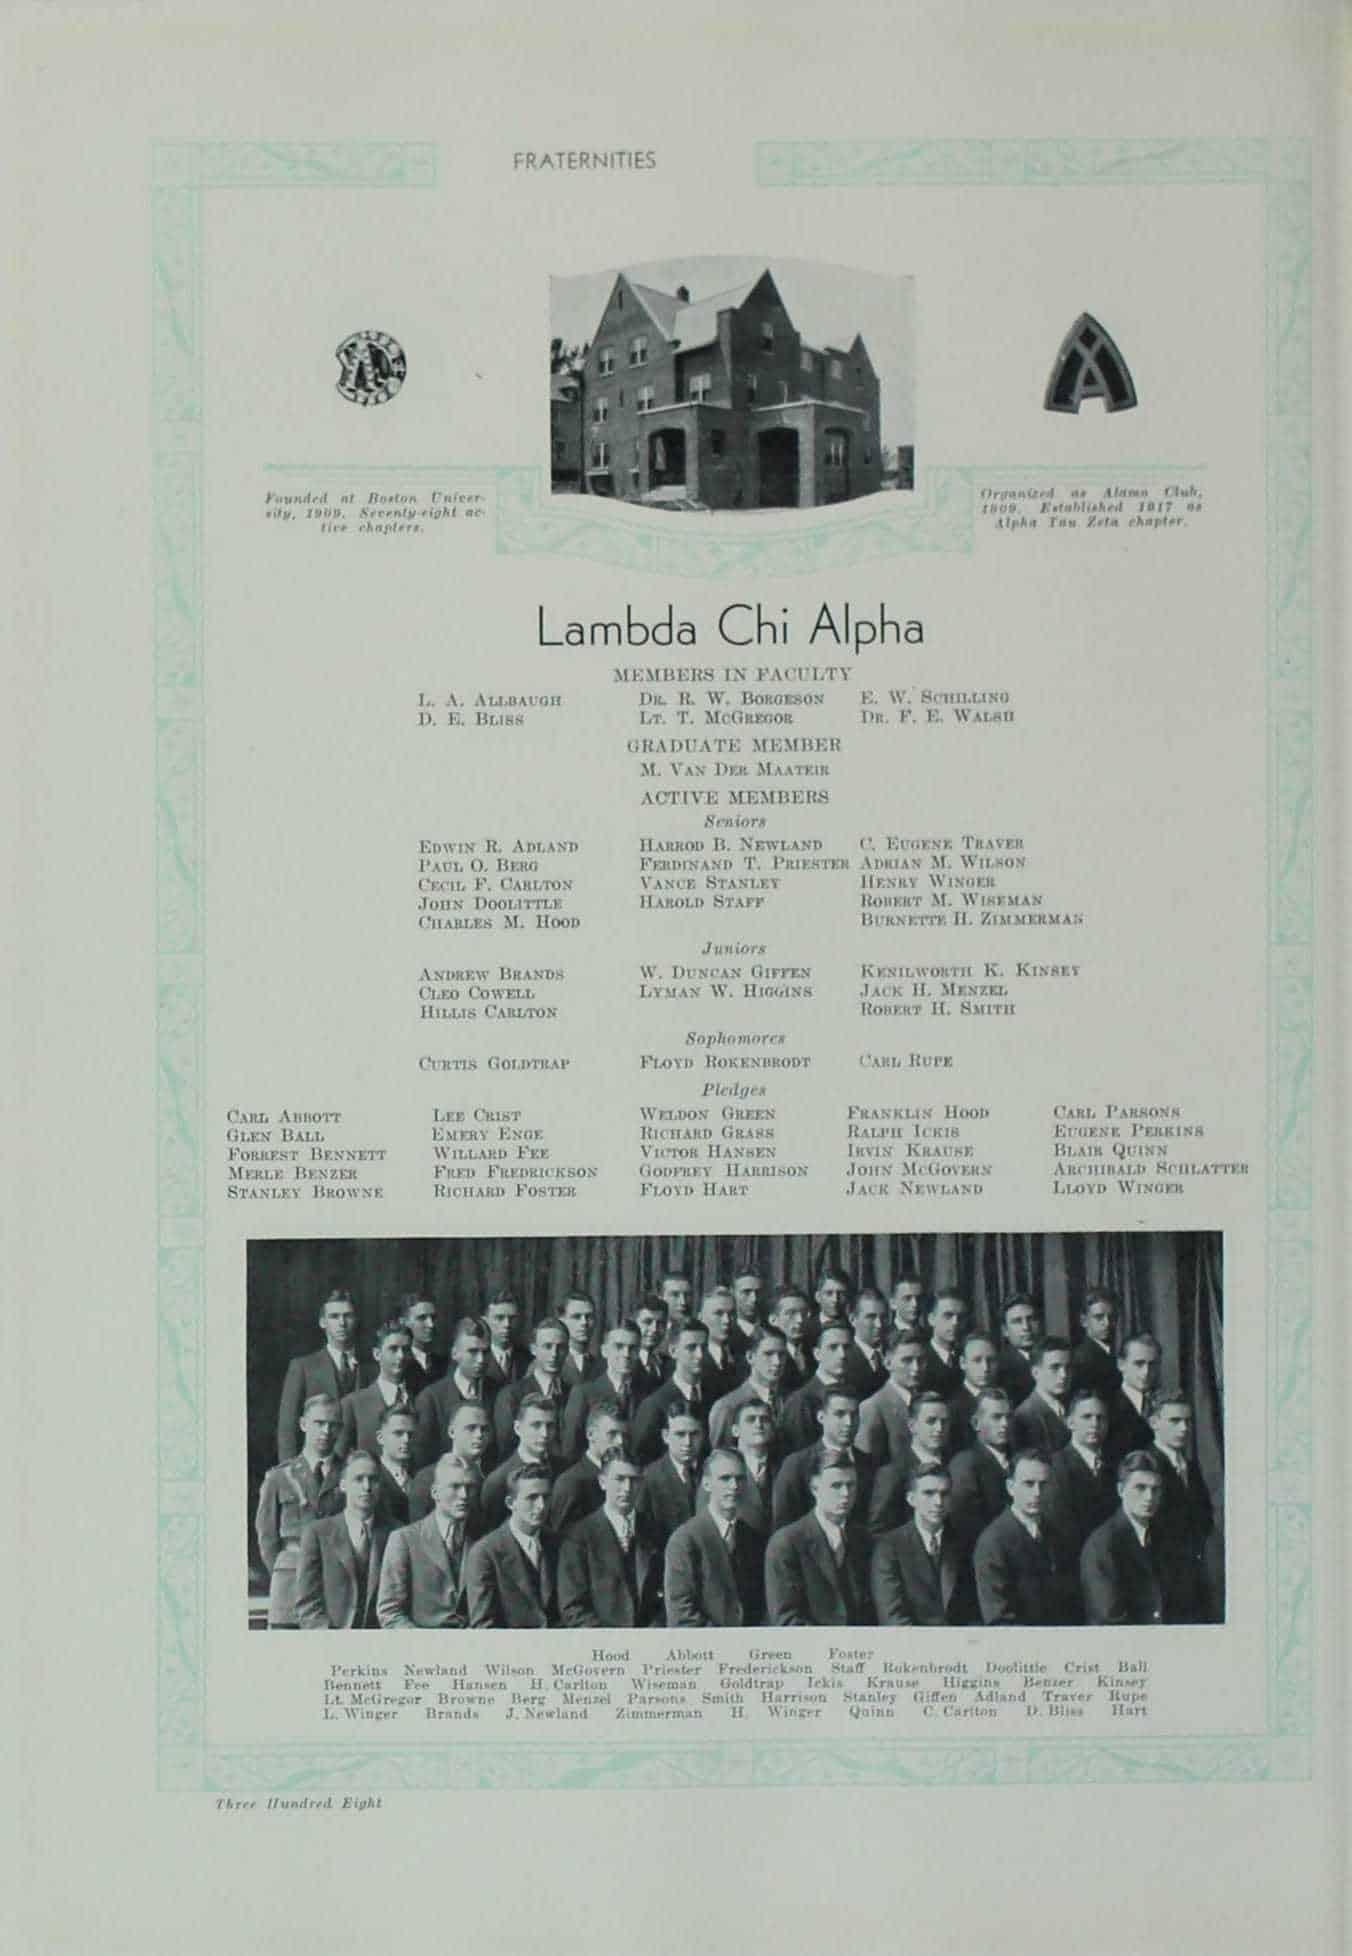 1931 Lambda Chi Alpha